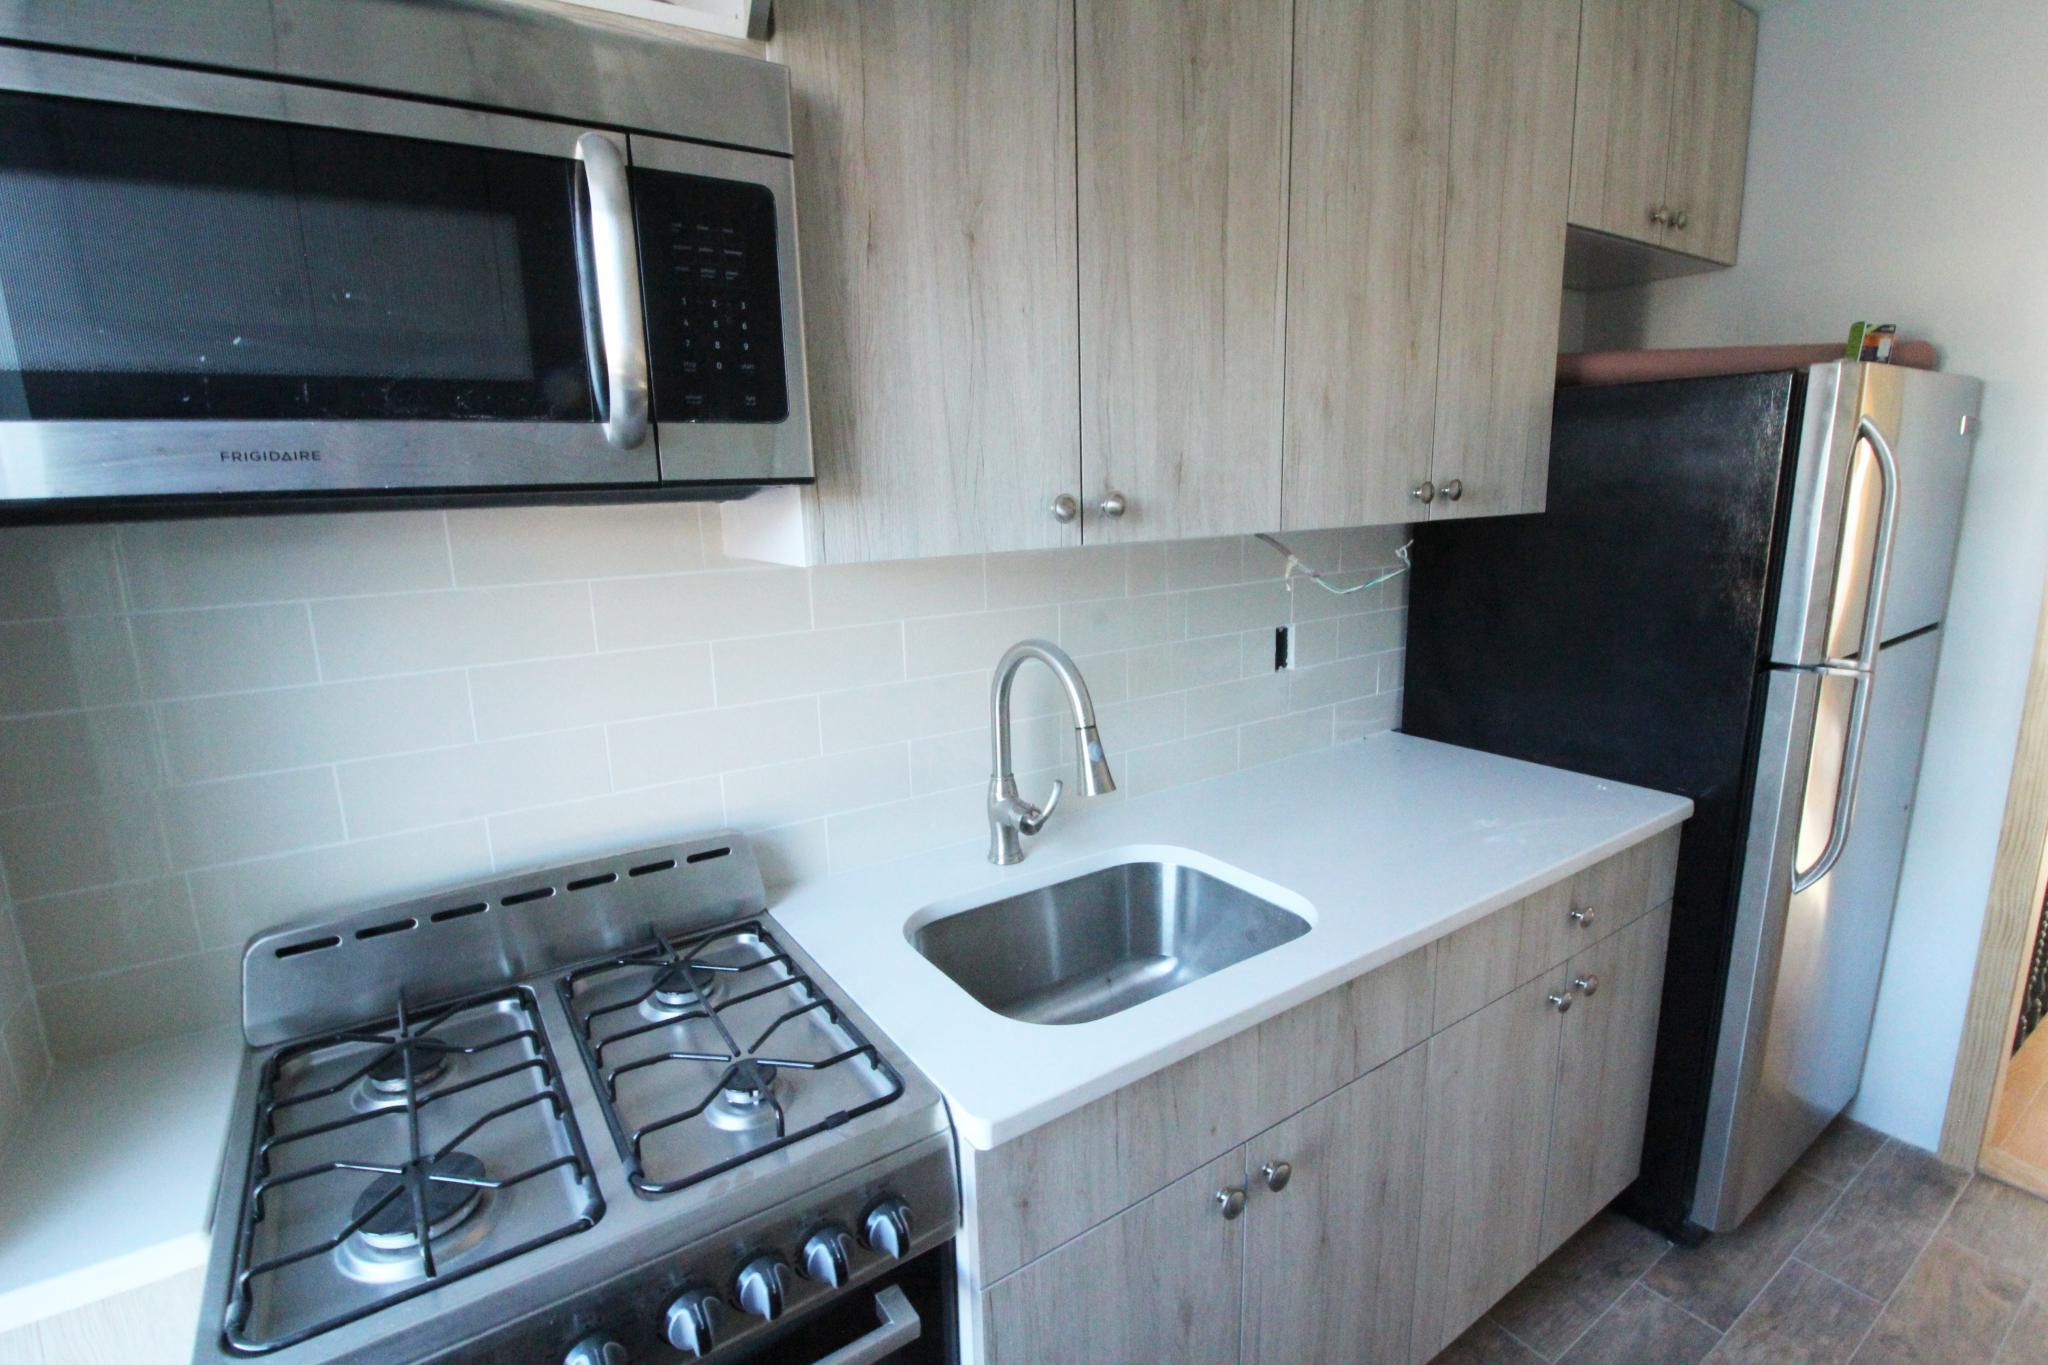 6822 60th St #1, Ridgewood, NY 11385 For Rent | Trulia